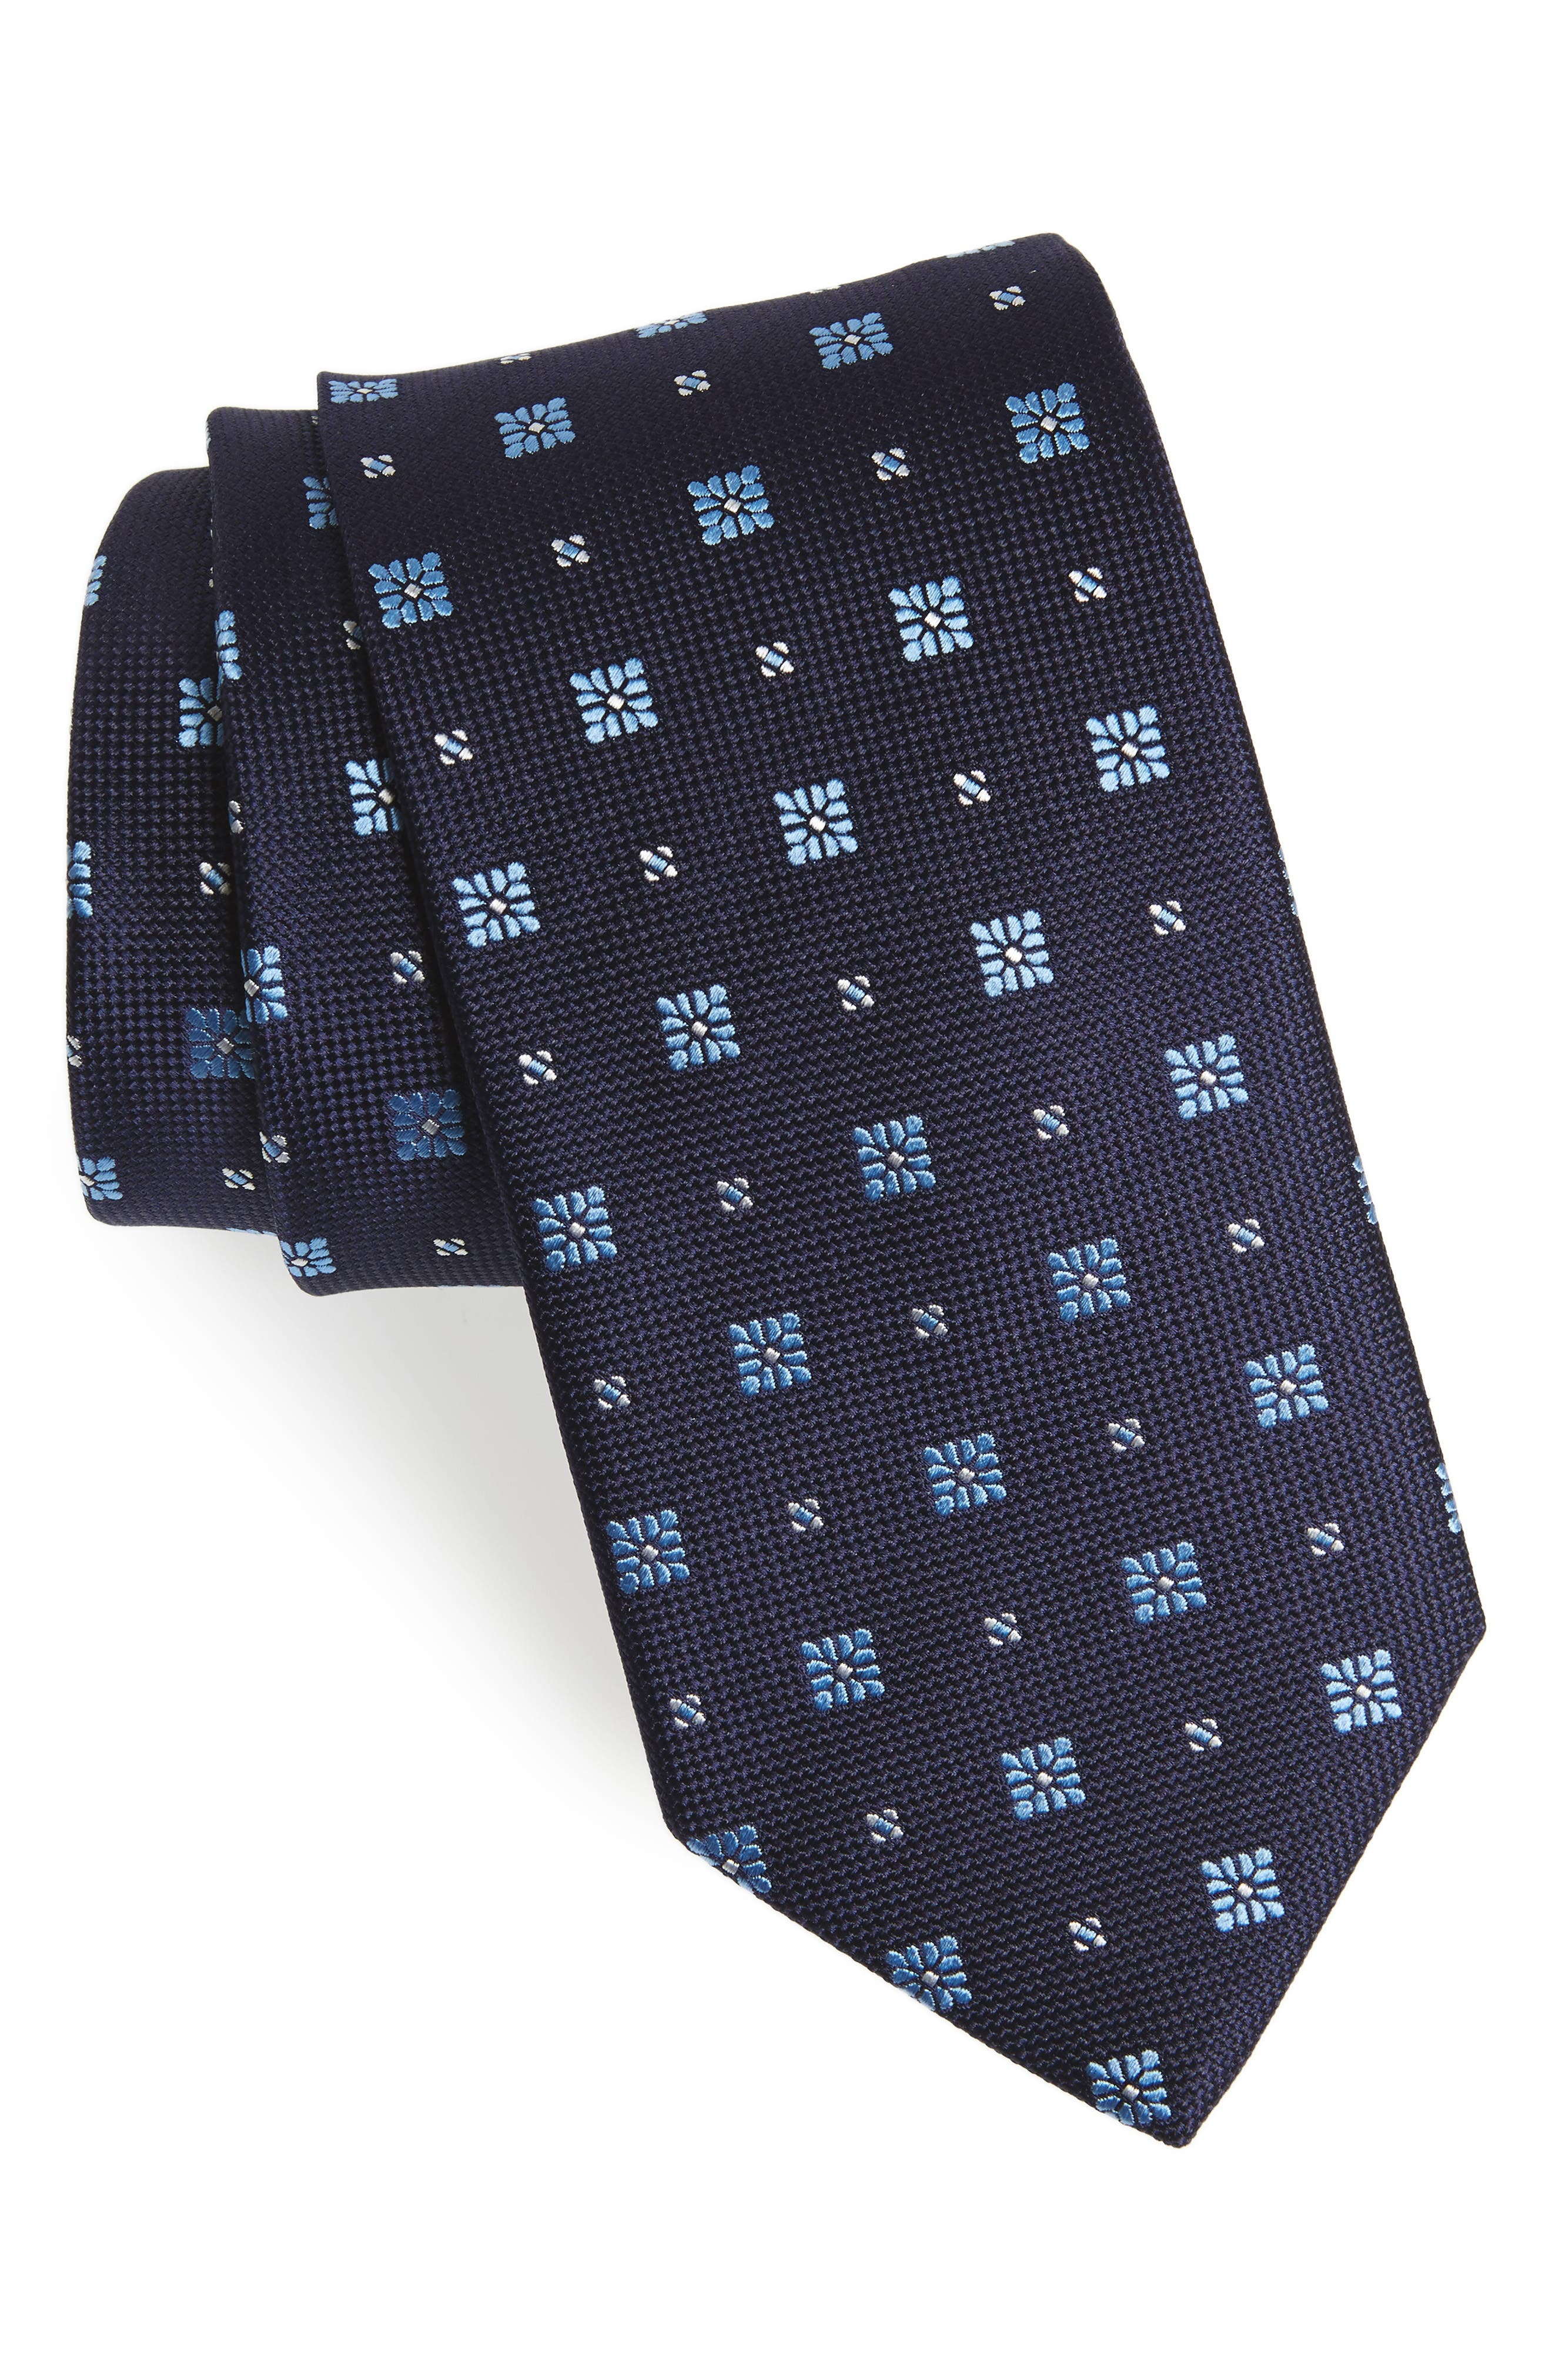 Alternate Image 1 Selected - Eton Medallion Silk Tie